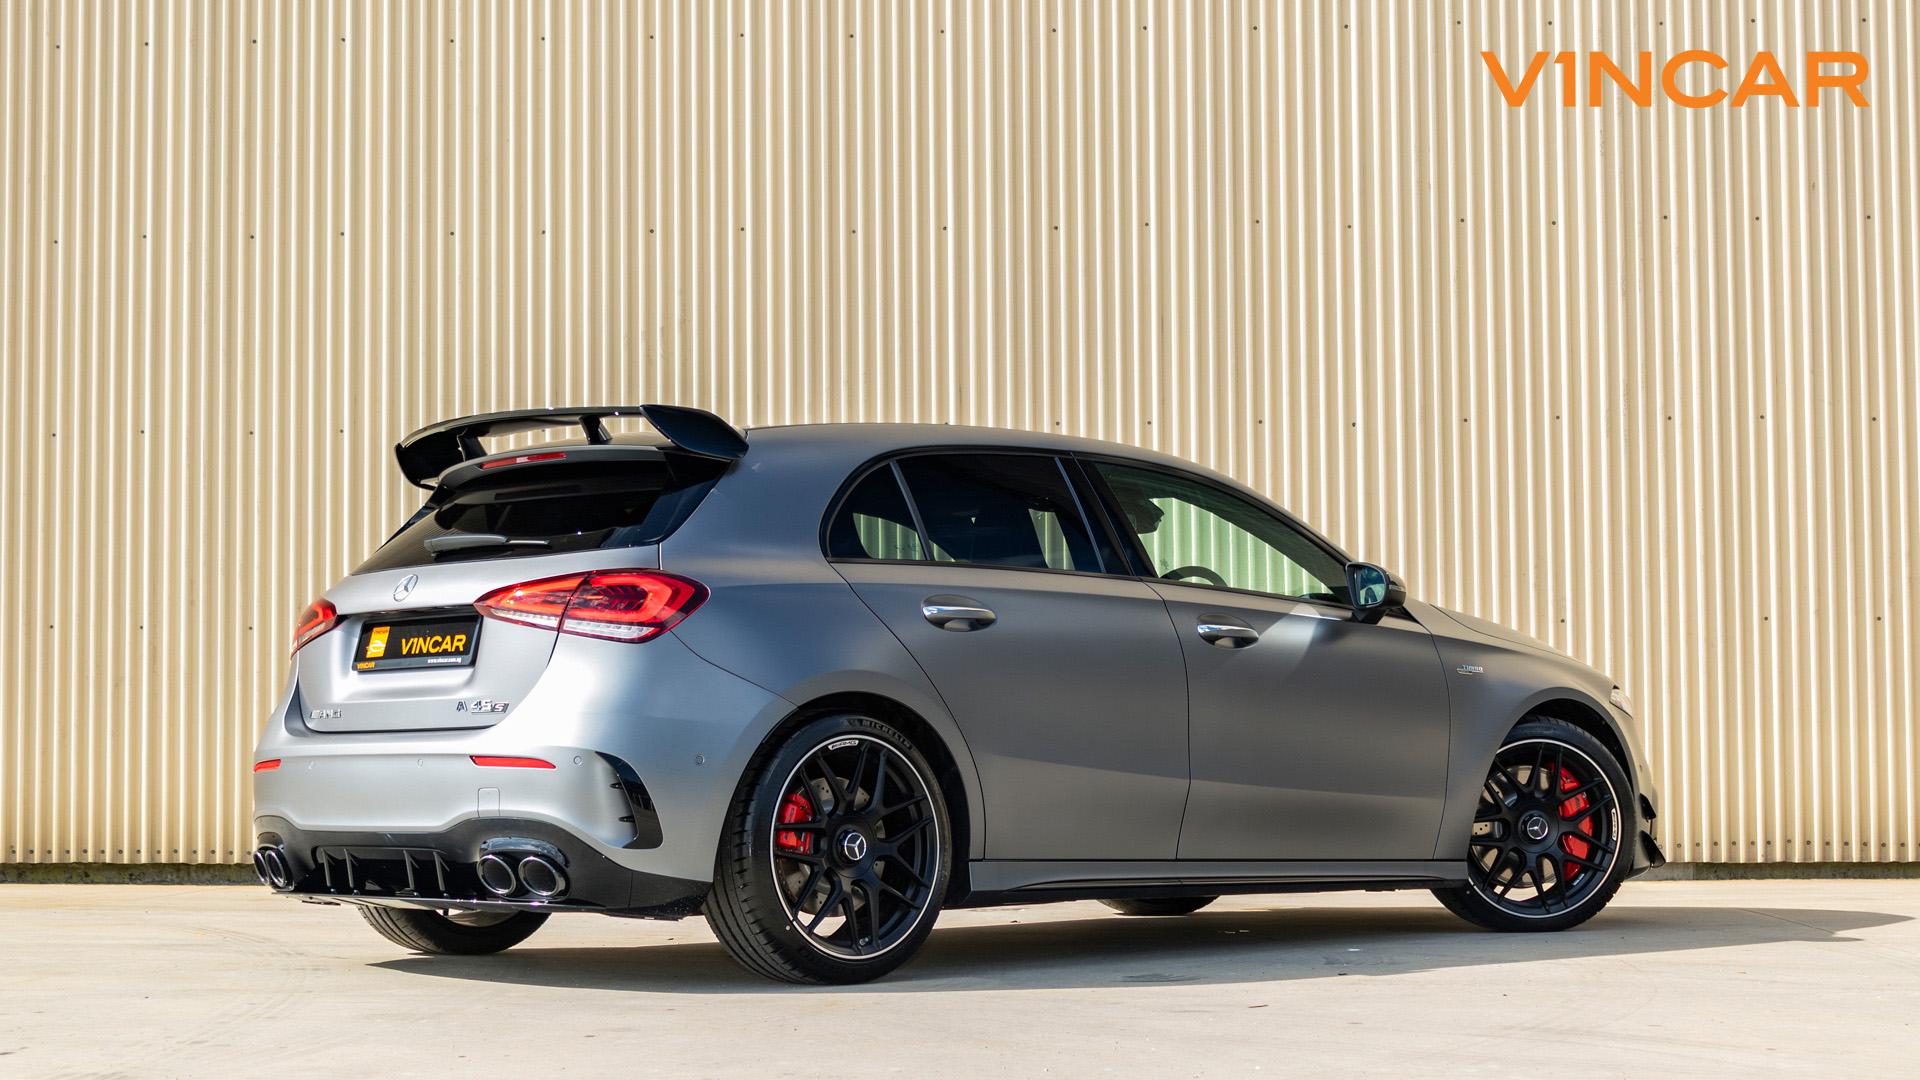 Mercedes-Benz A45 S 4MATIC+ Plus AMG | Performance Hatchback